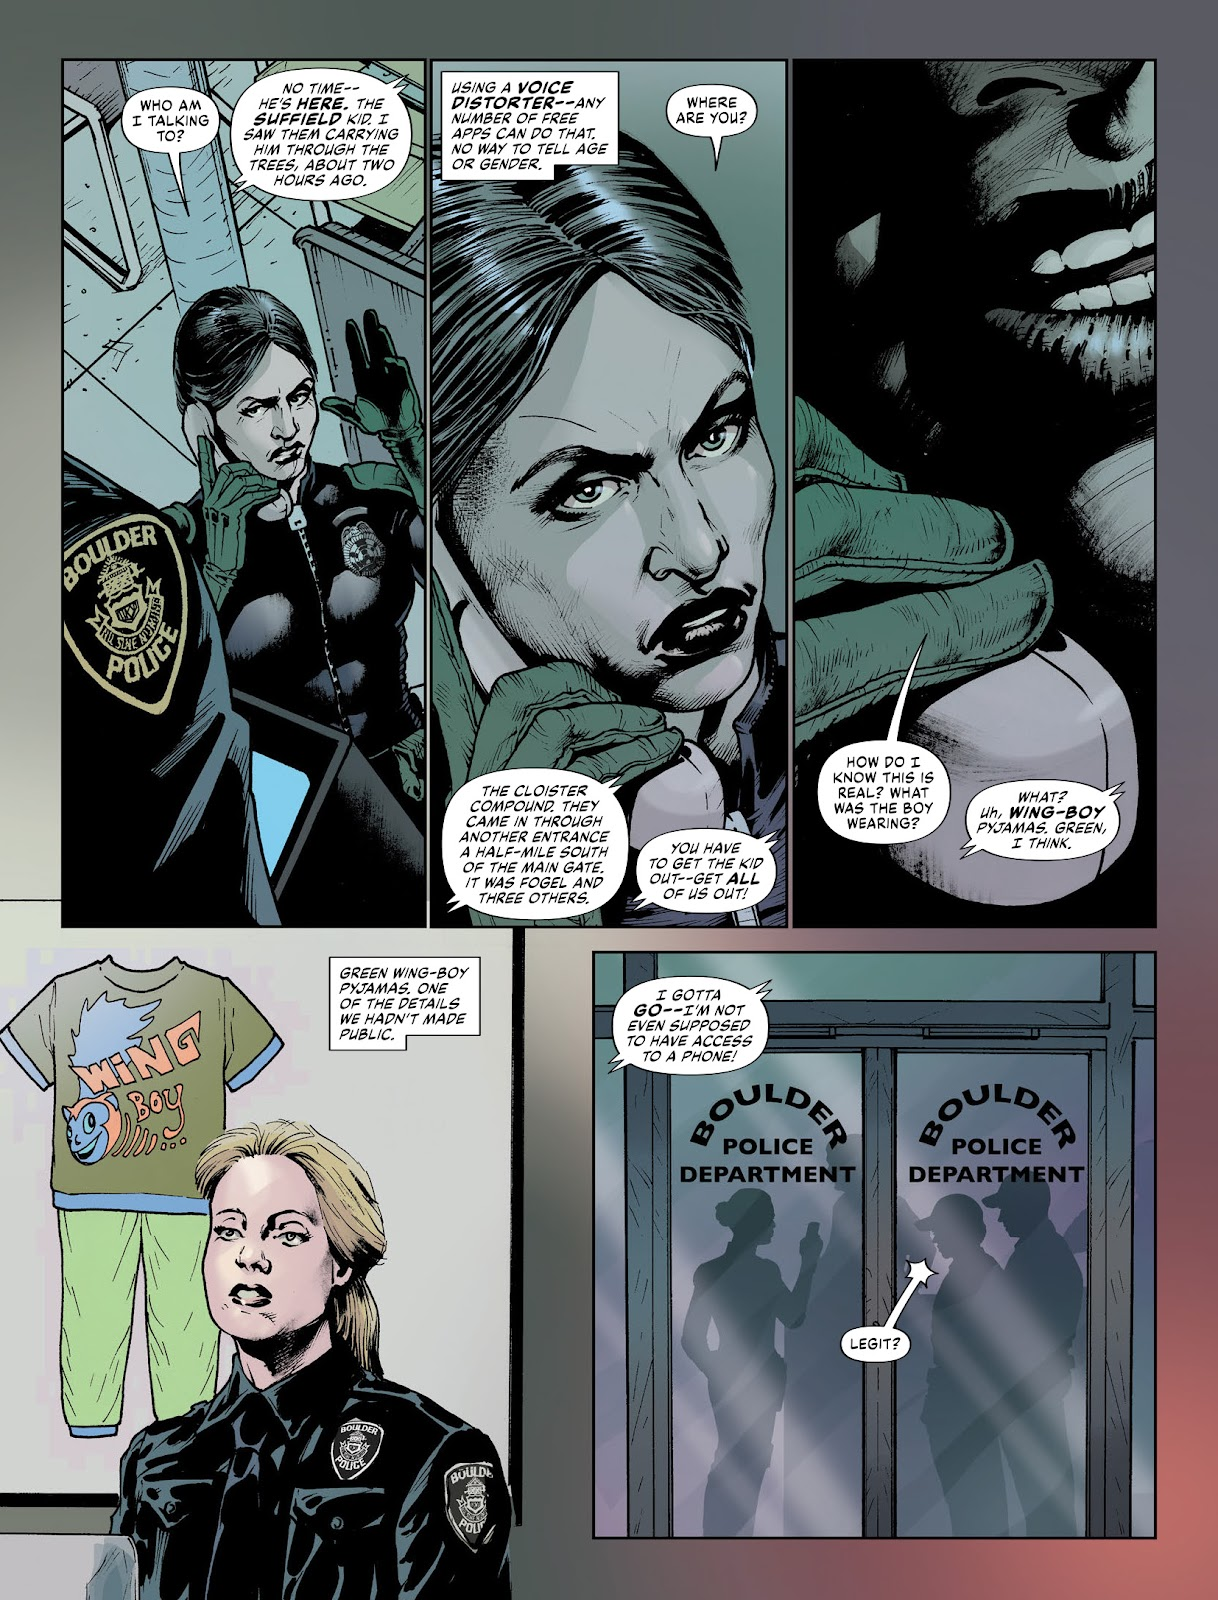 Judge Dredd Megazine (Vol. 5) issue 427 - Page 34